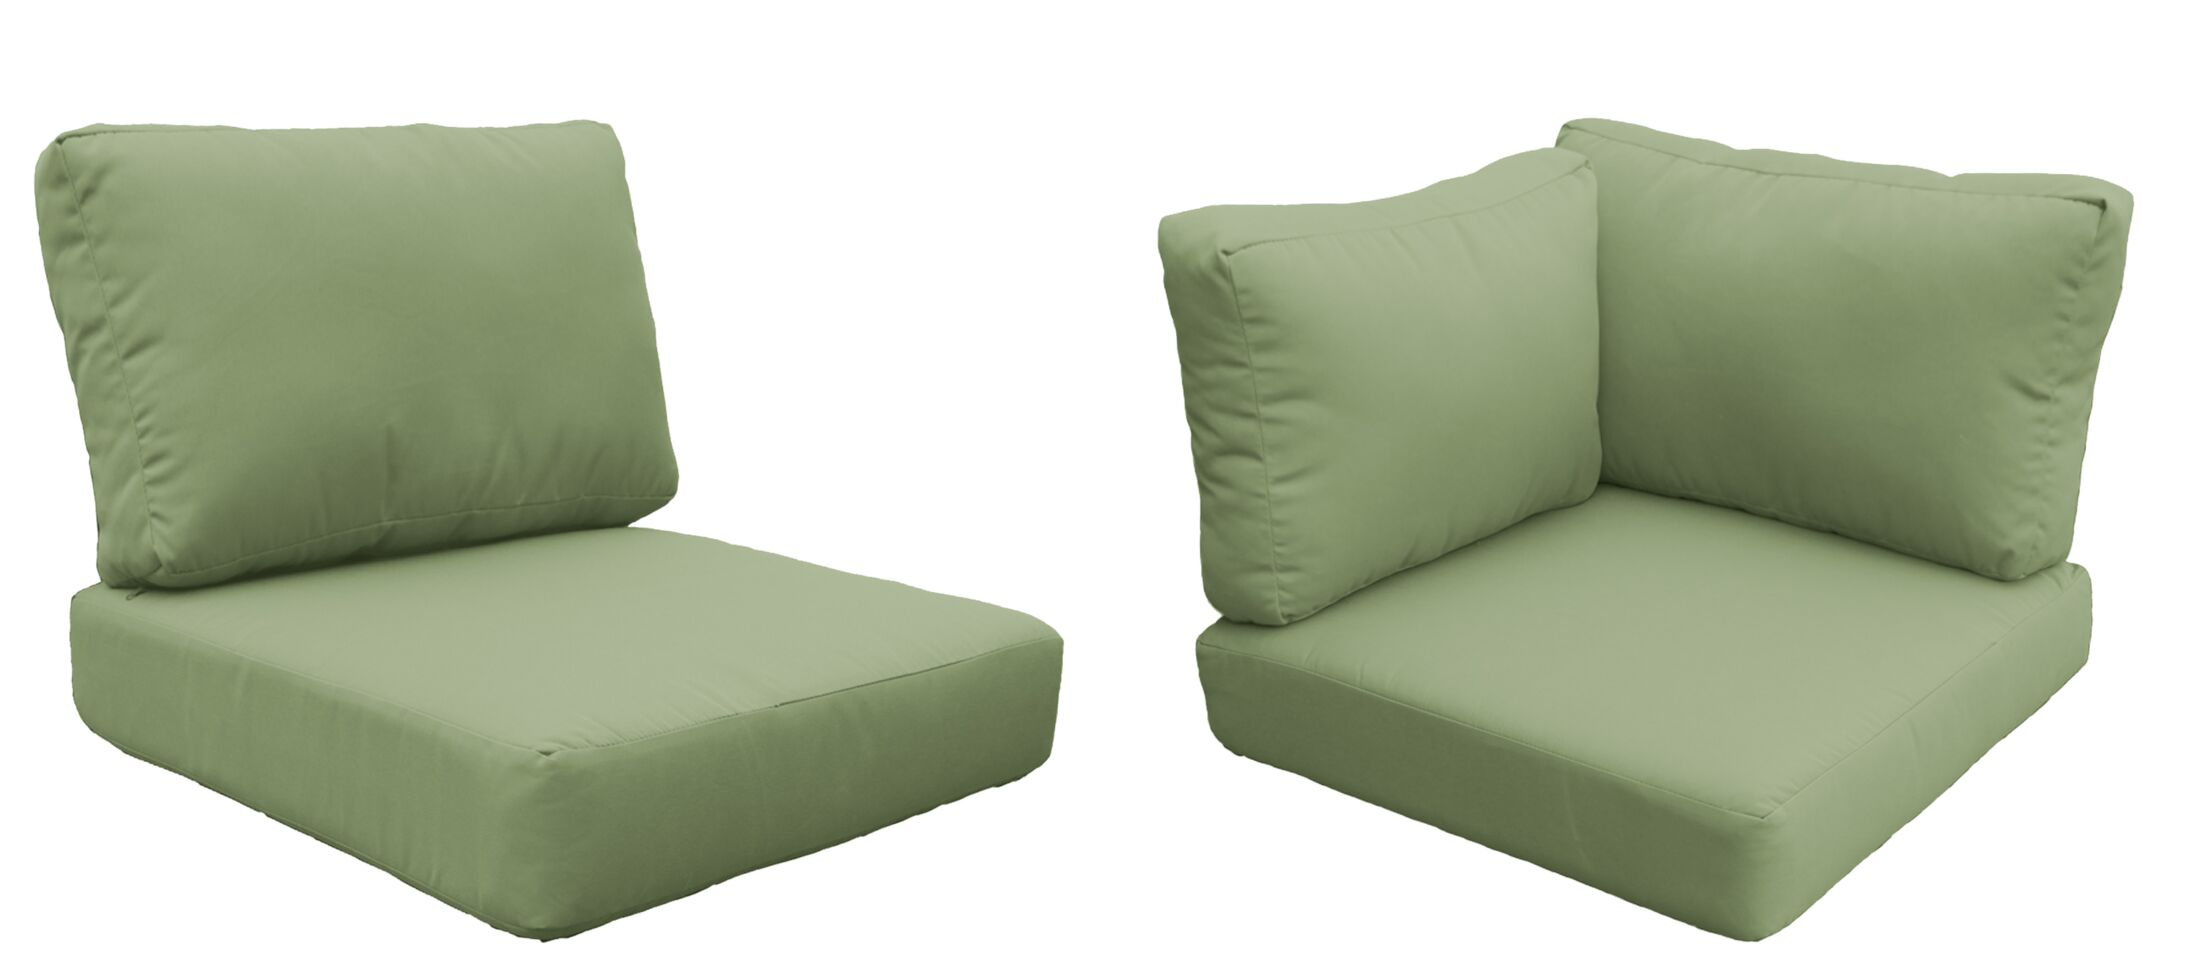 Barbados Outdoor Lounge Chair Cushion Fabric: Cilantro